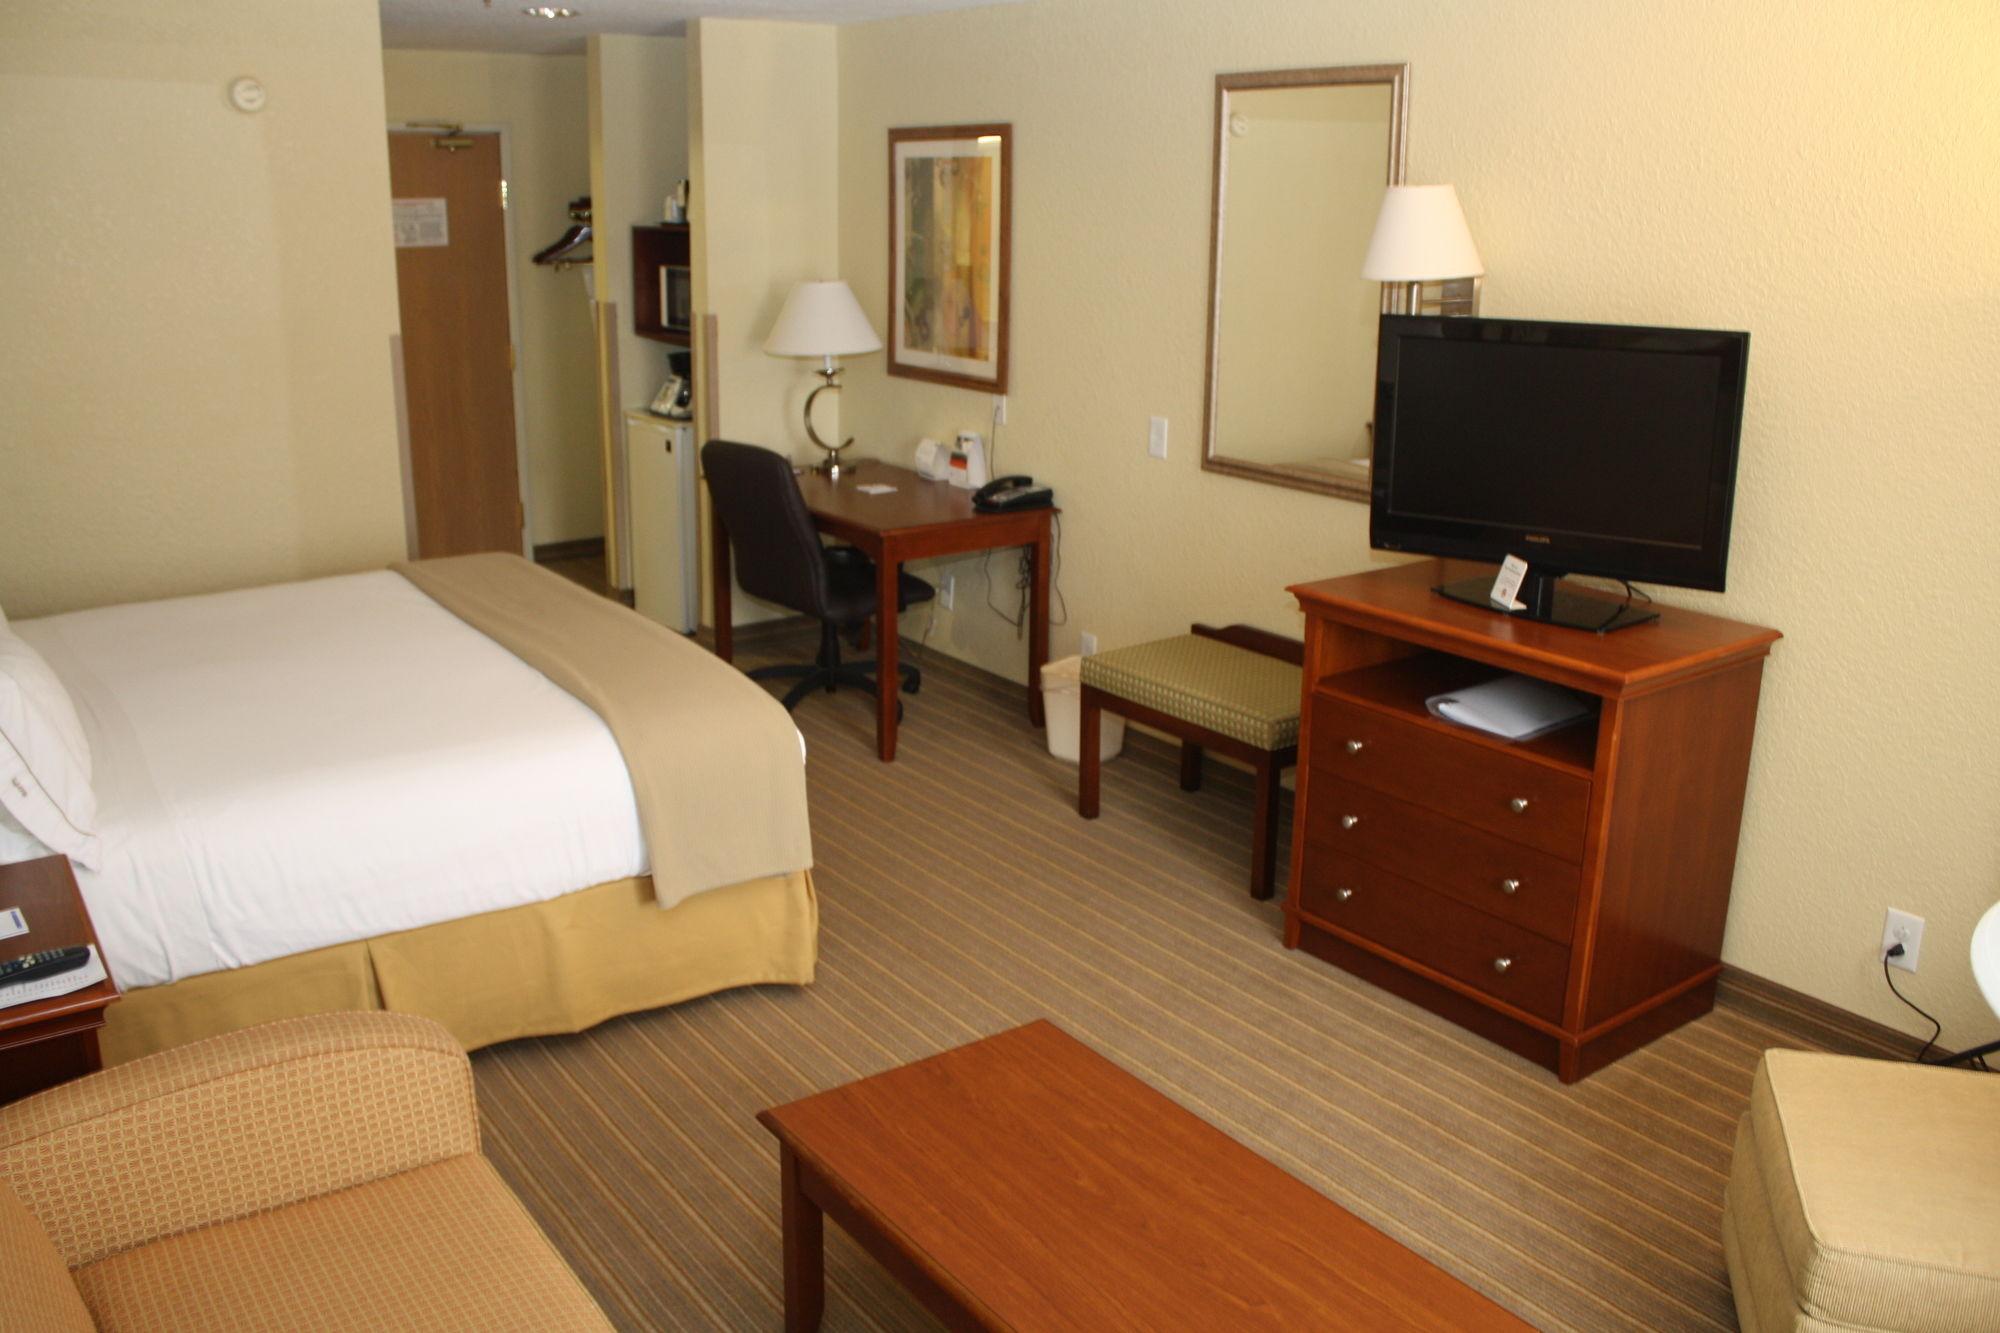 Holiday Inn Express Winfield in Hurricane, WV